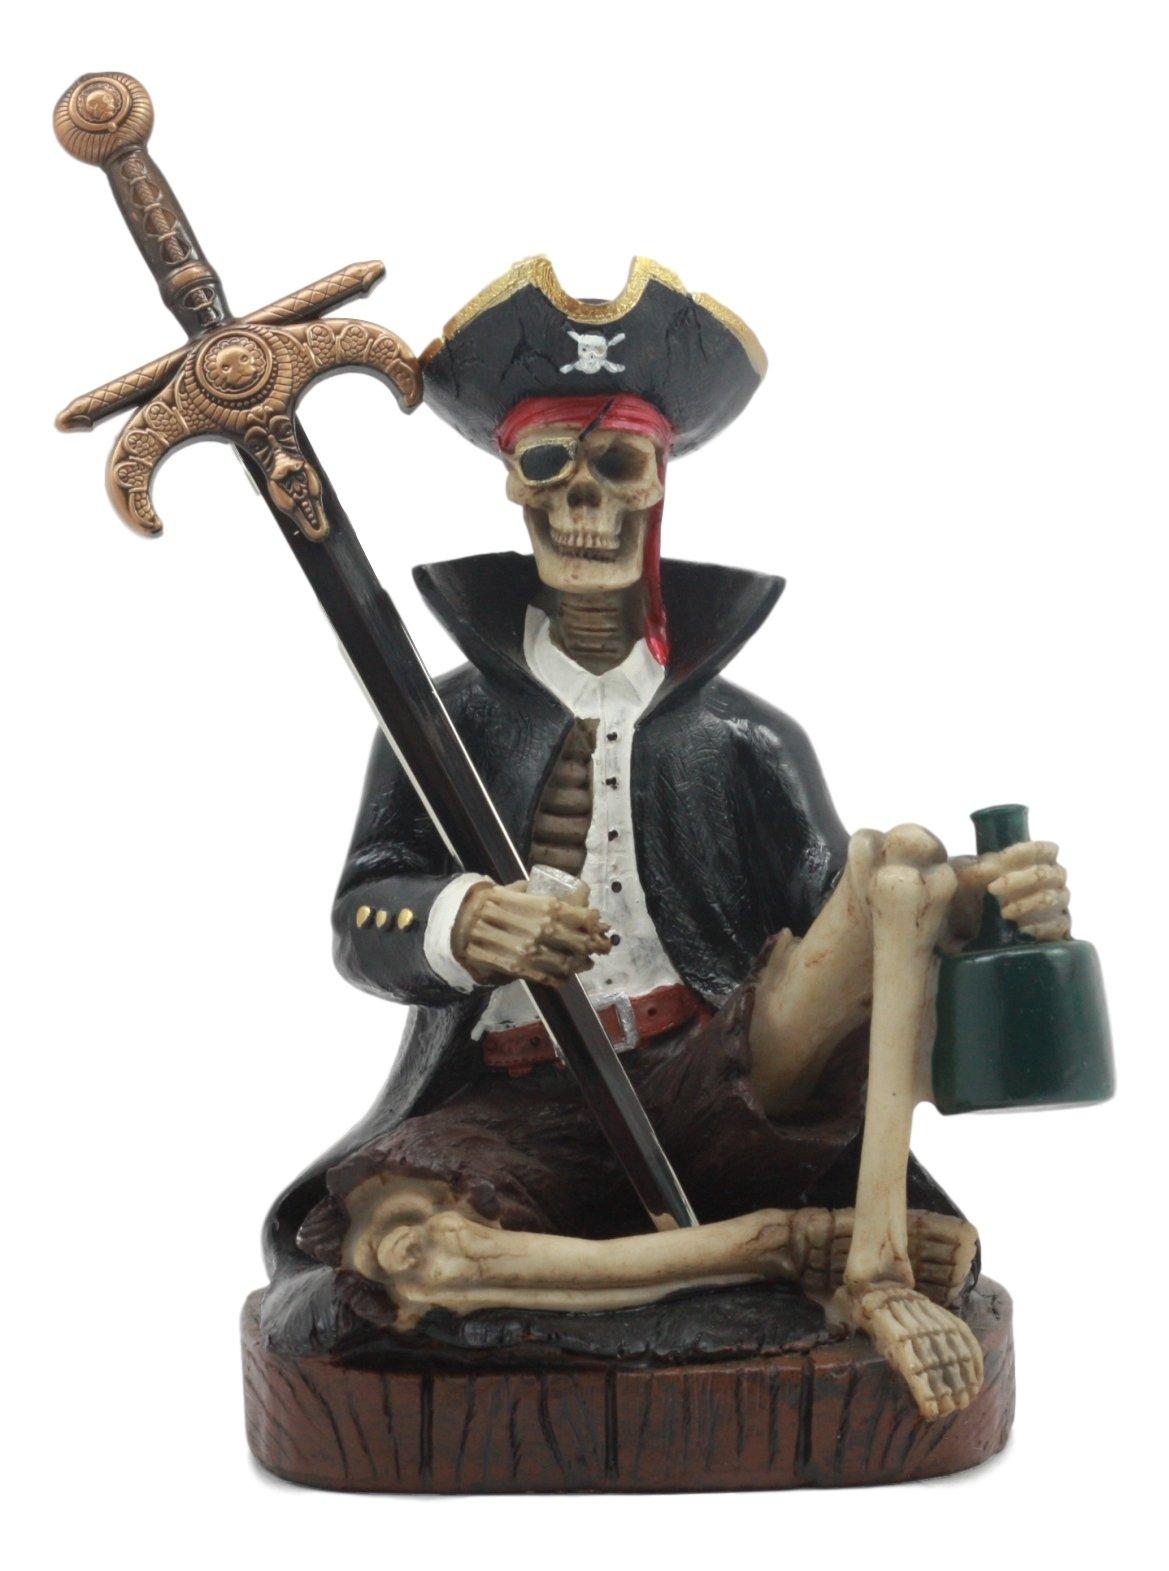 Ebros Rum Mail Pirate Captain Skeleton Letter Opener Statue Set with Dagger Knife Dead Man Tells No Tales Davy Jones Curse Office Desktop Accessory